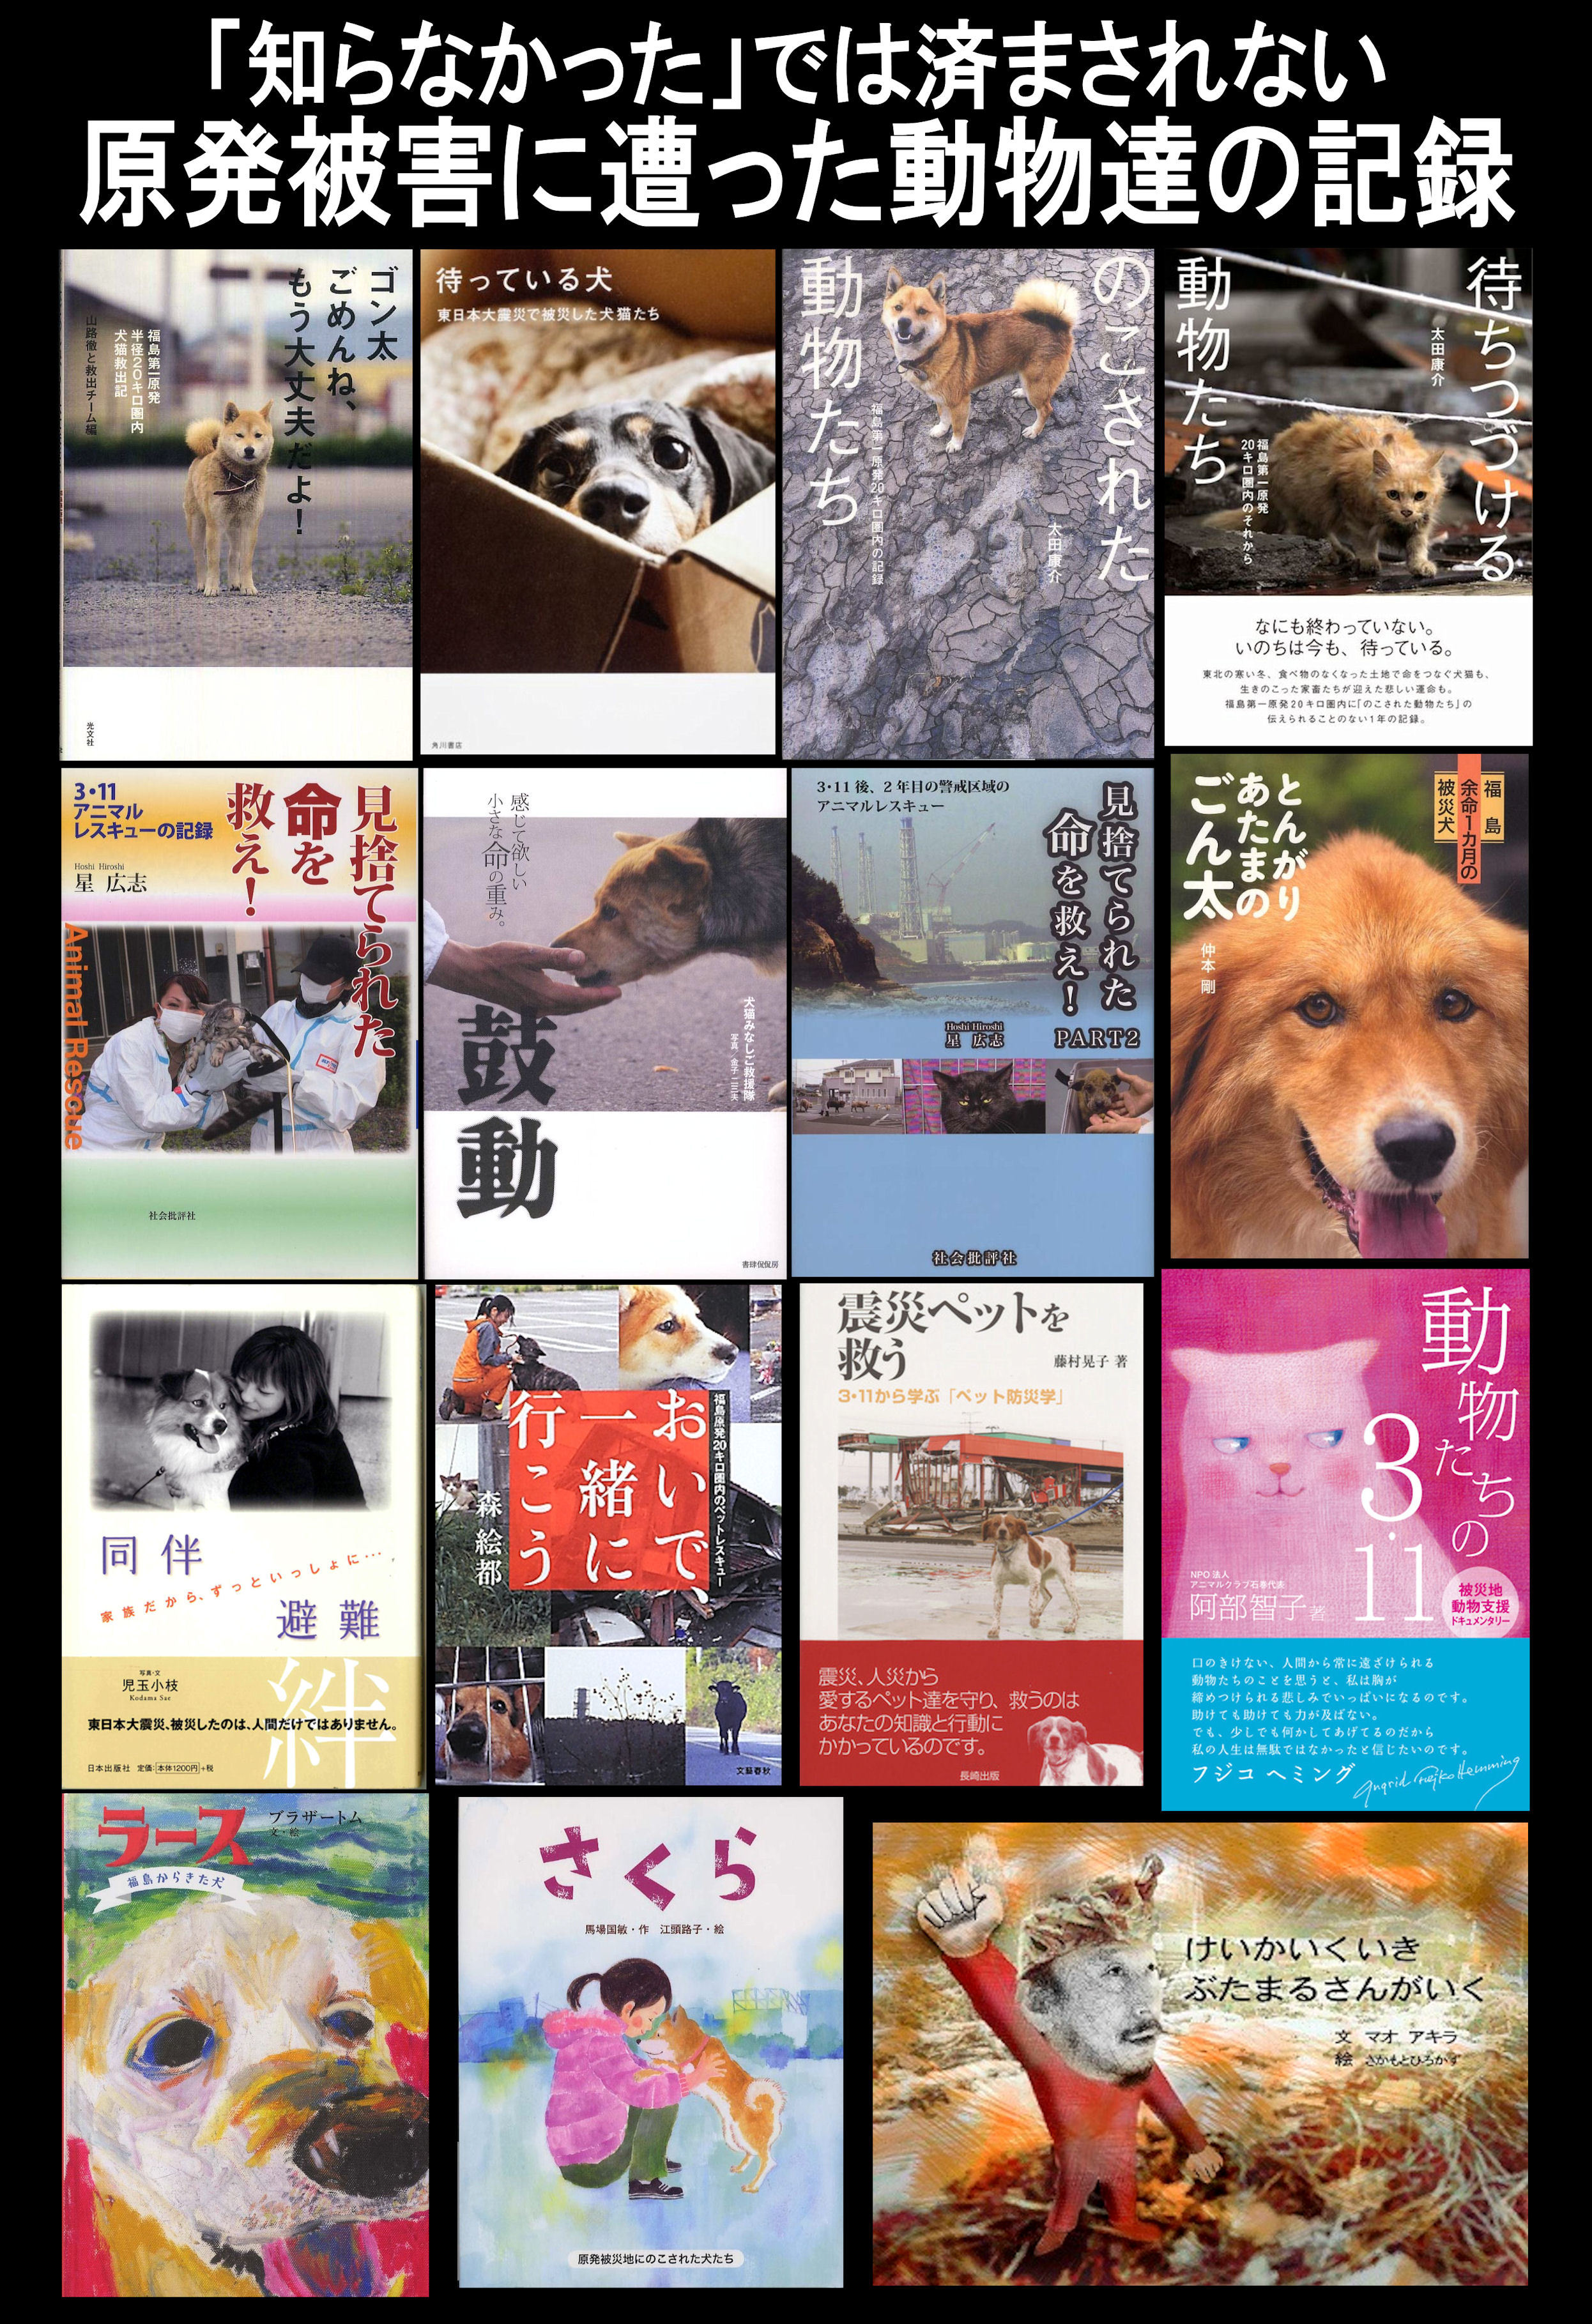 hisaibook2.jpg